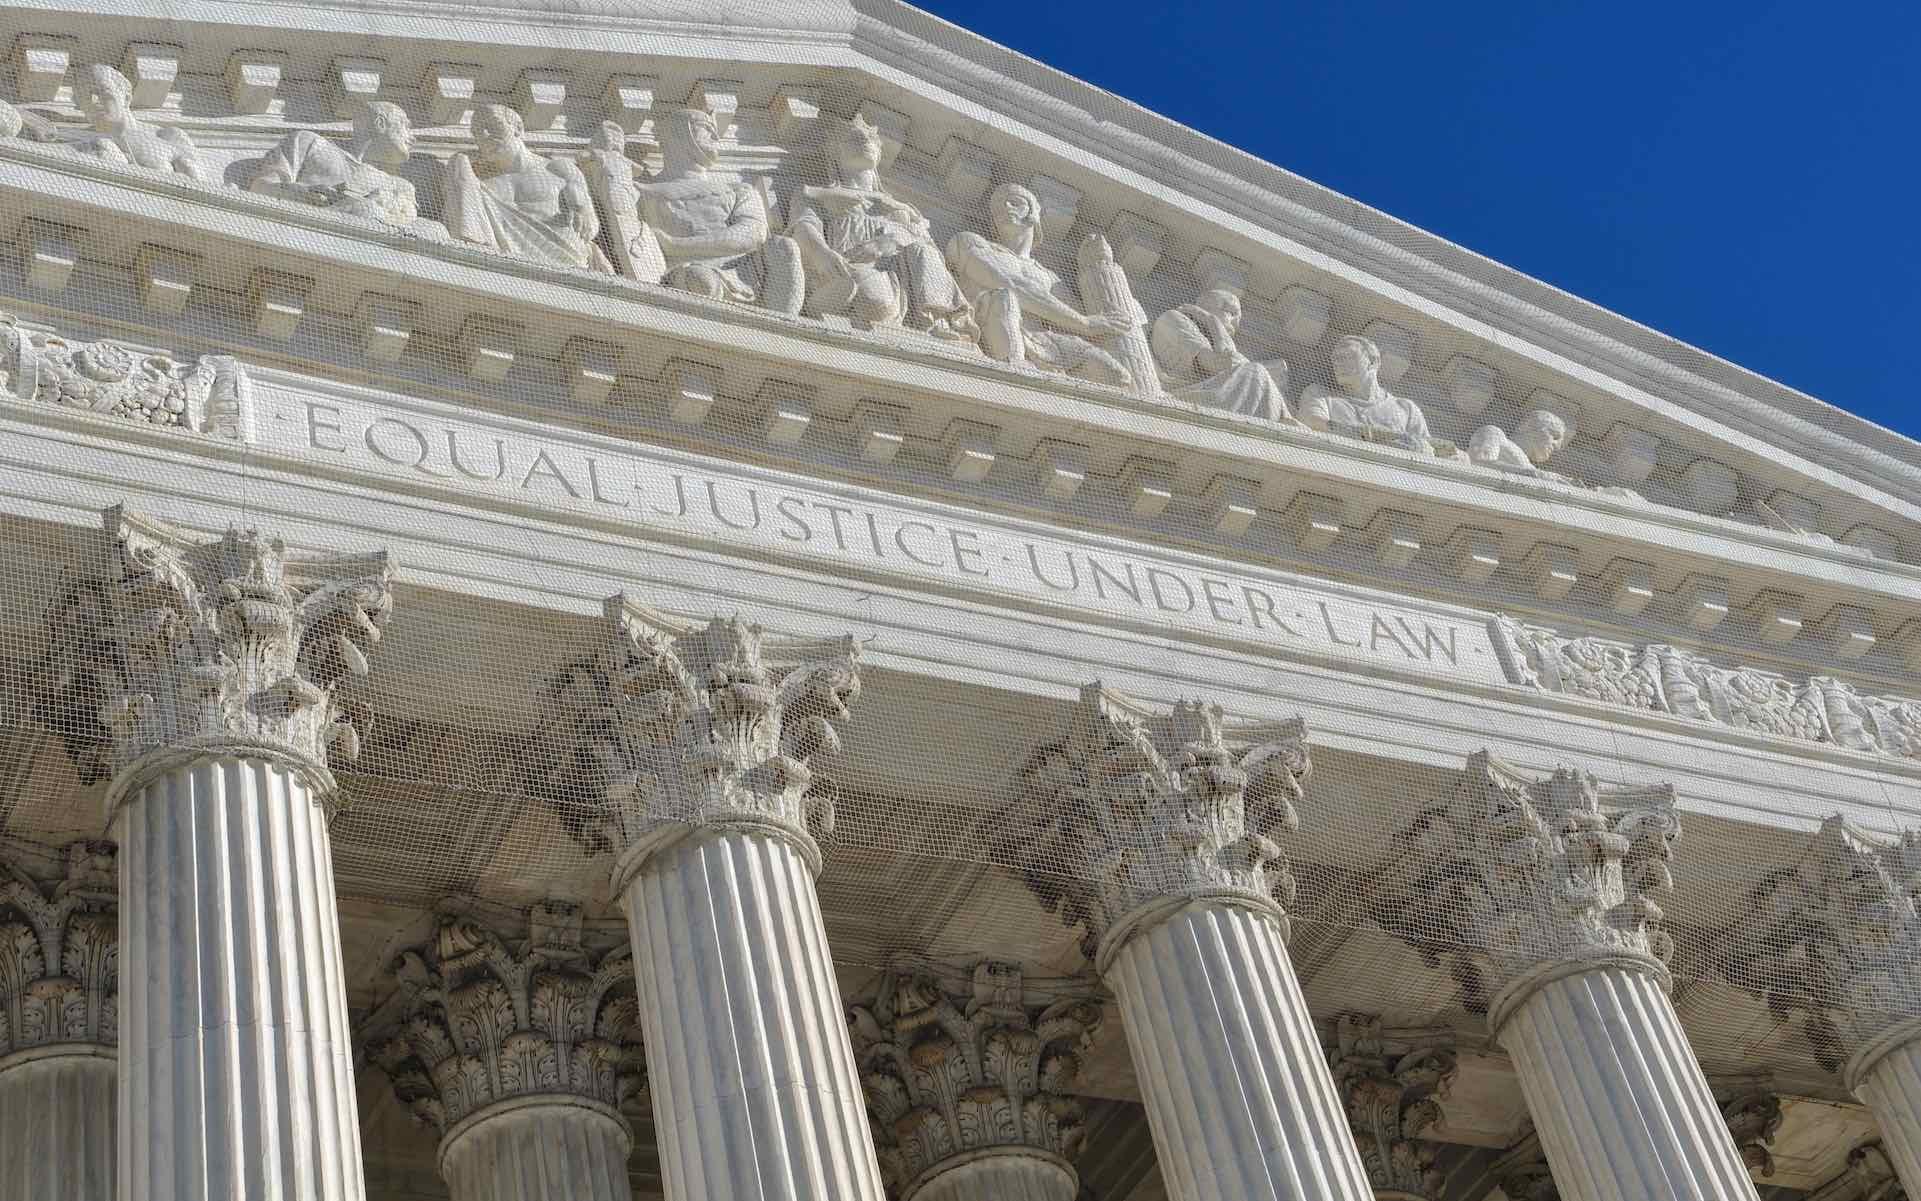 Supreme Court declines to hear challenge to marijuana's Schedule I status